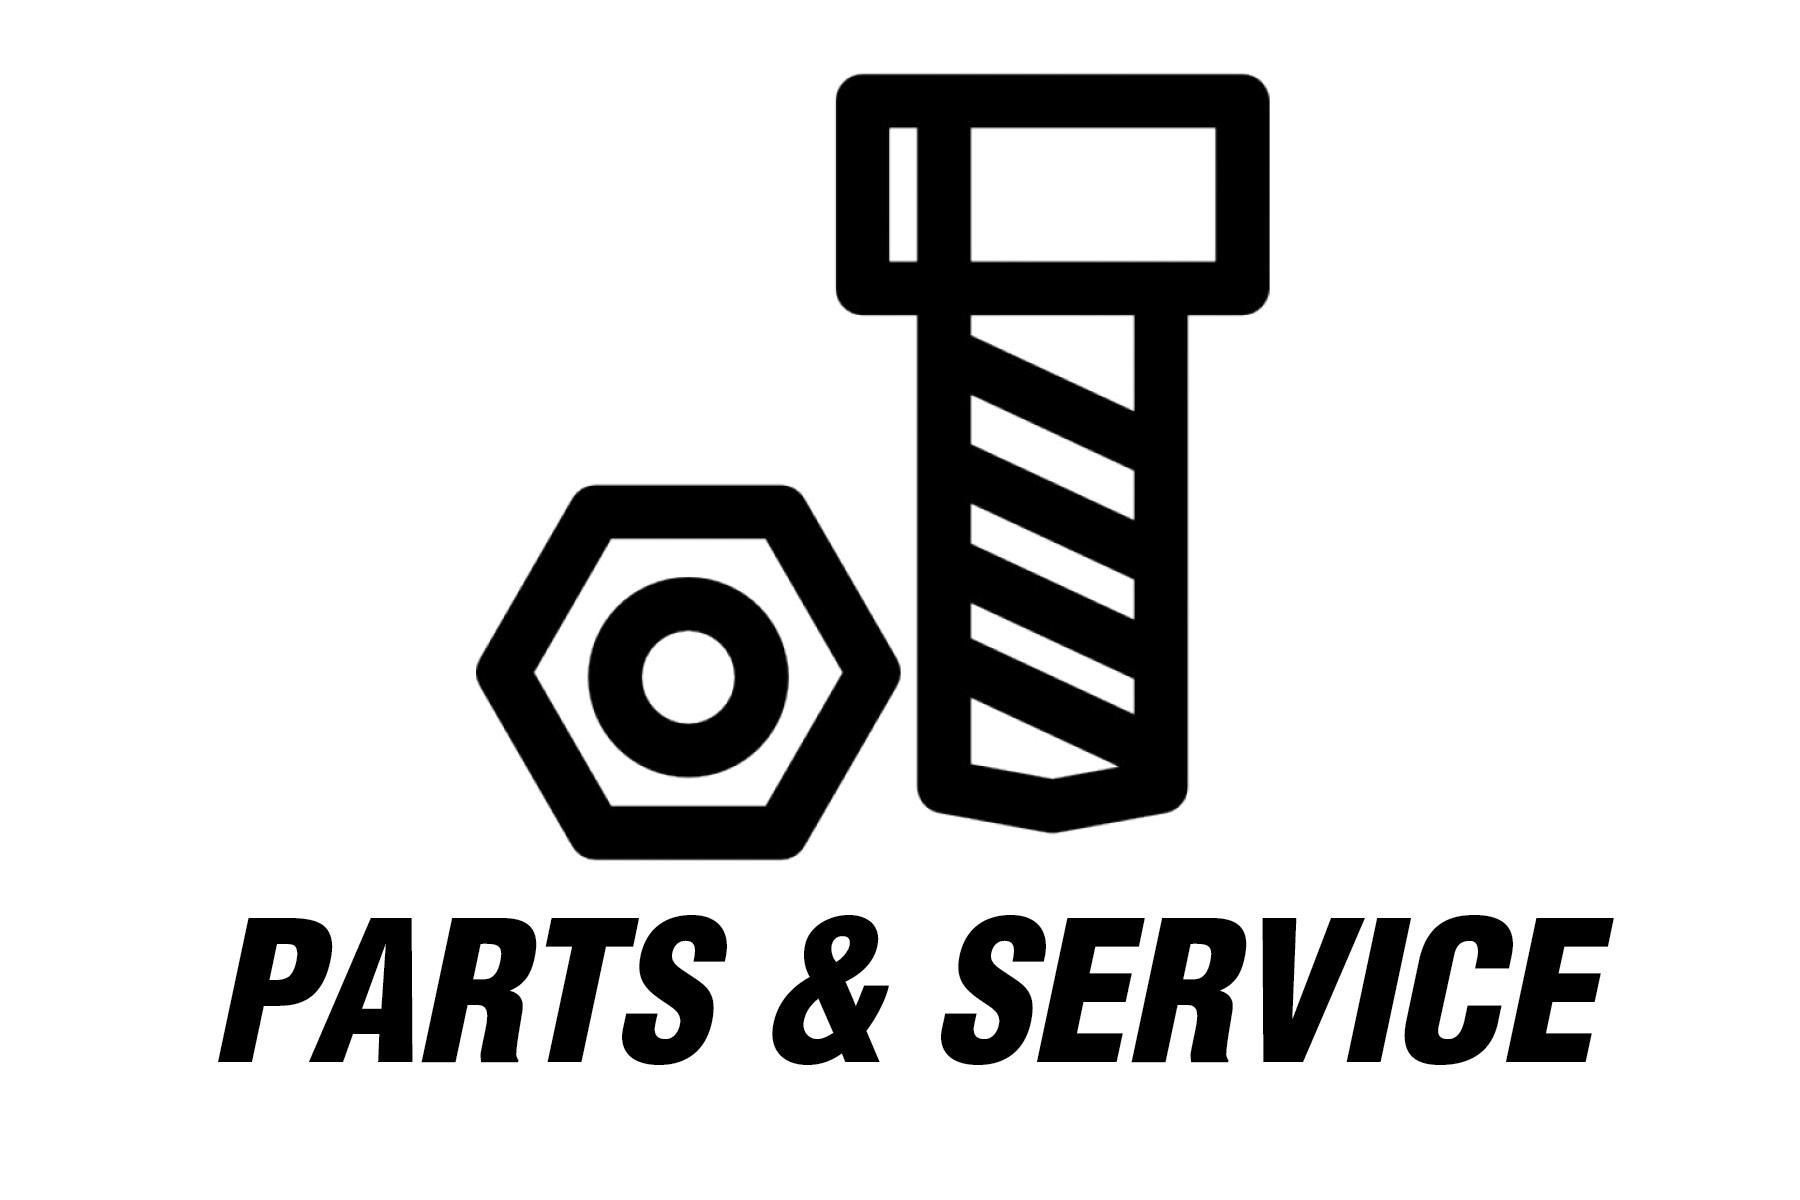 Parts & Service